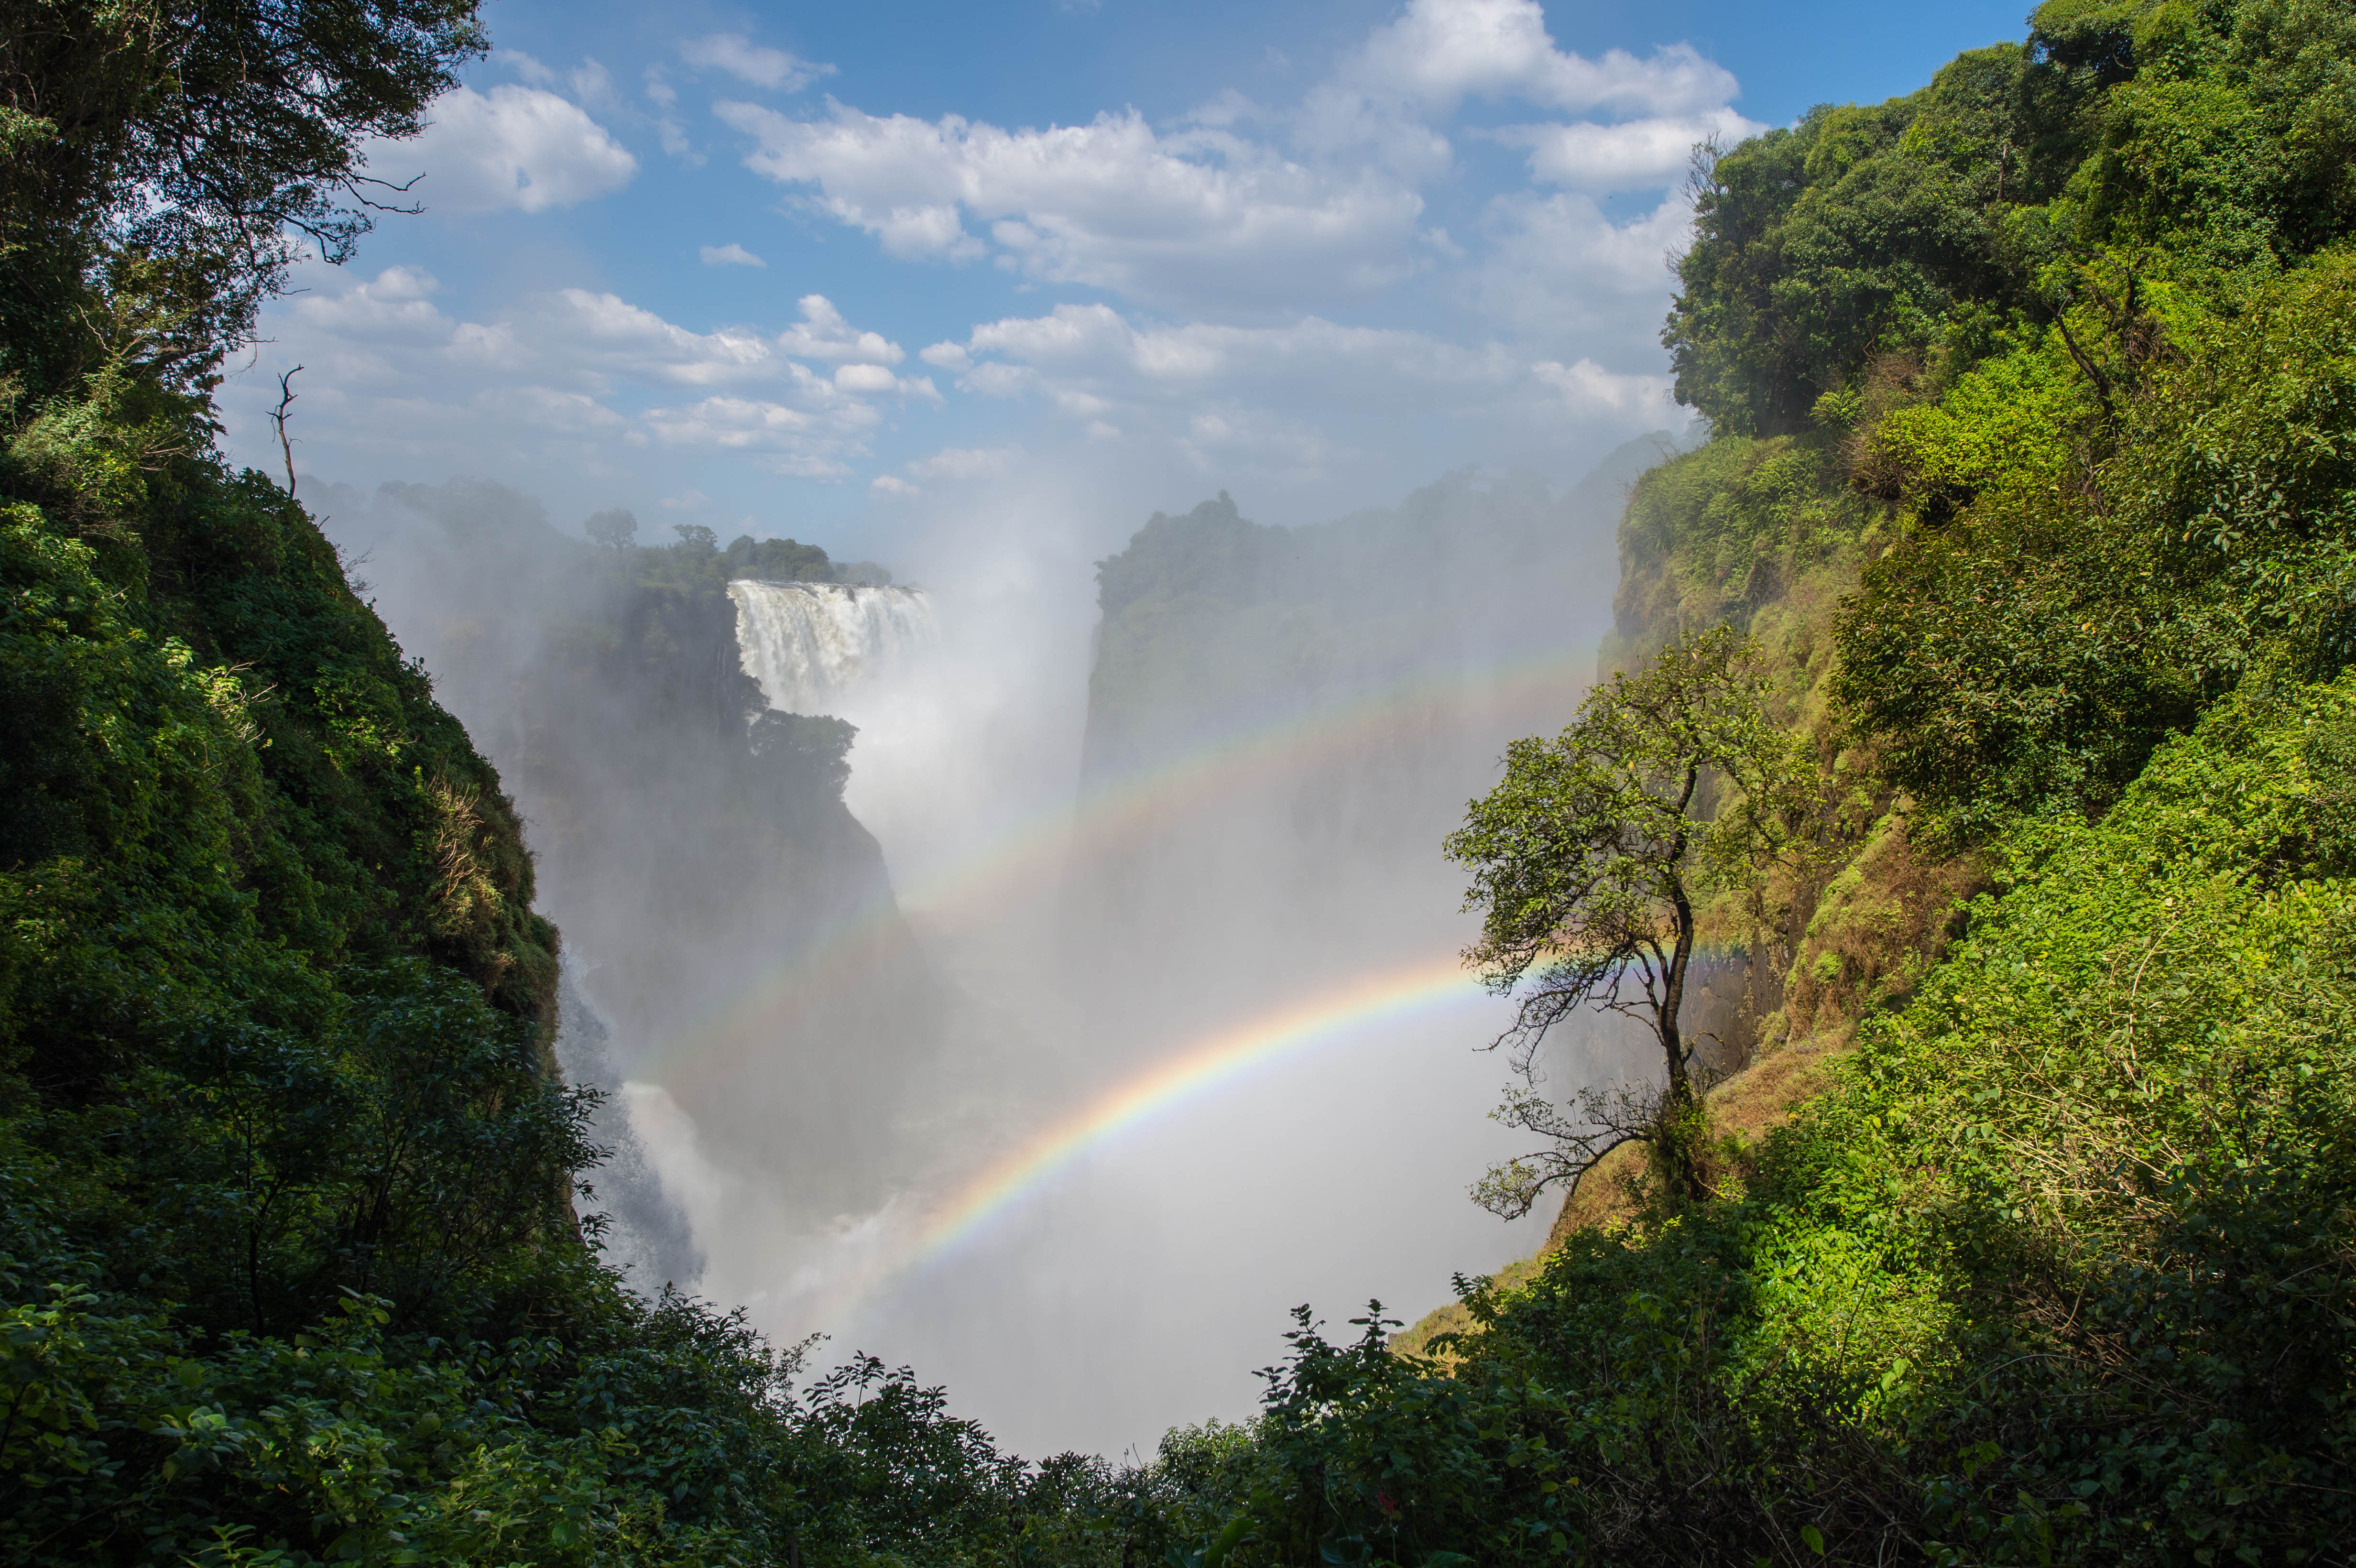 sunway_zimbabwe_victoria_falls_bruce_taylor-0686_20150320_1266789314